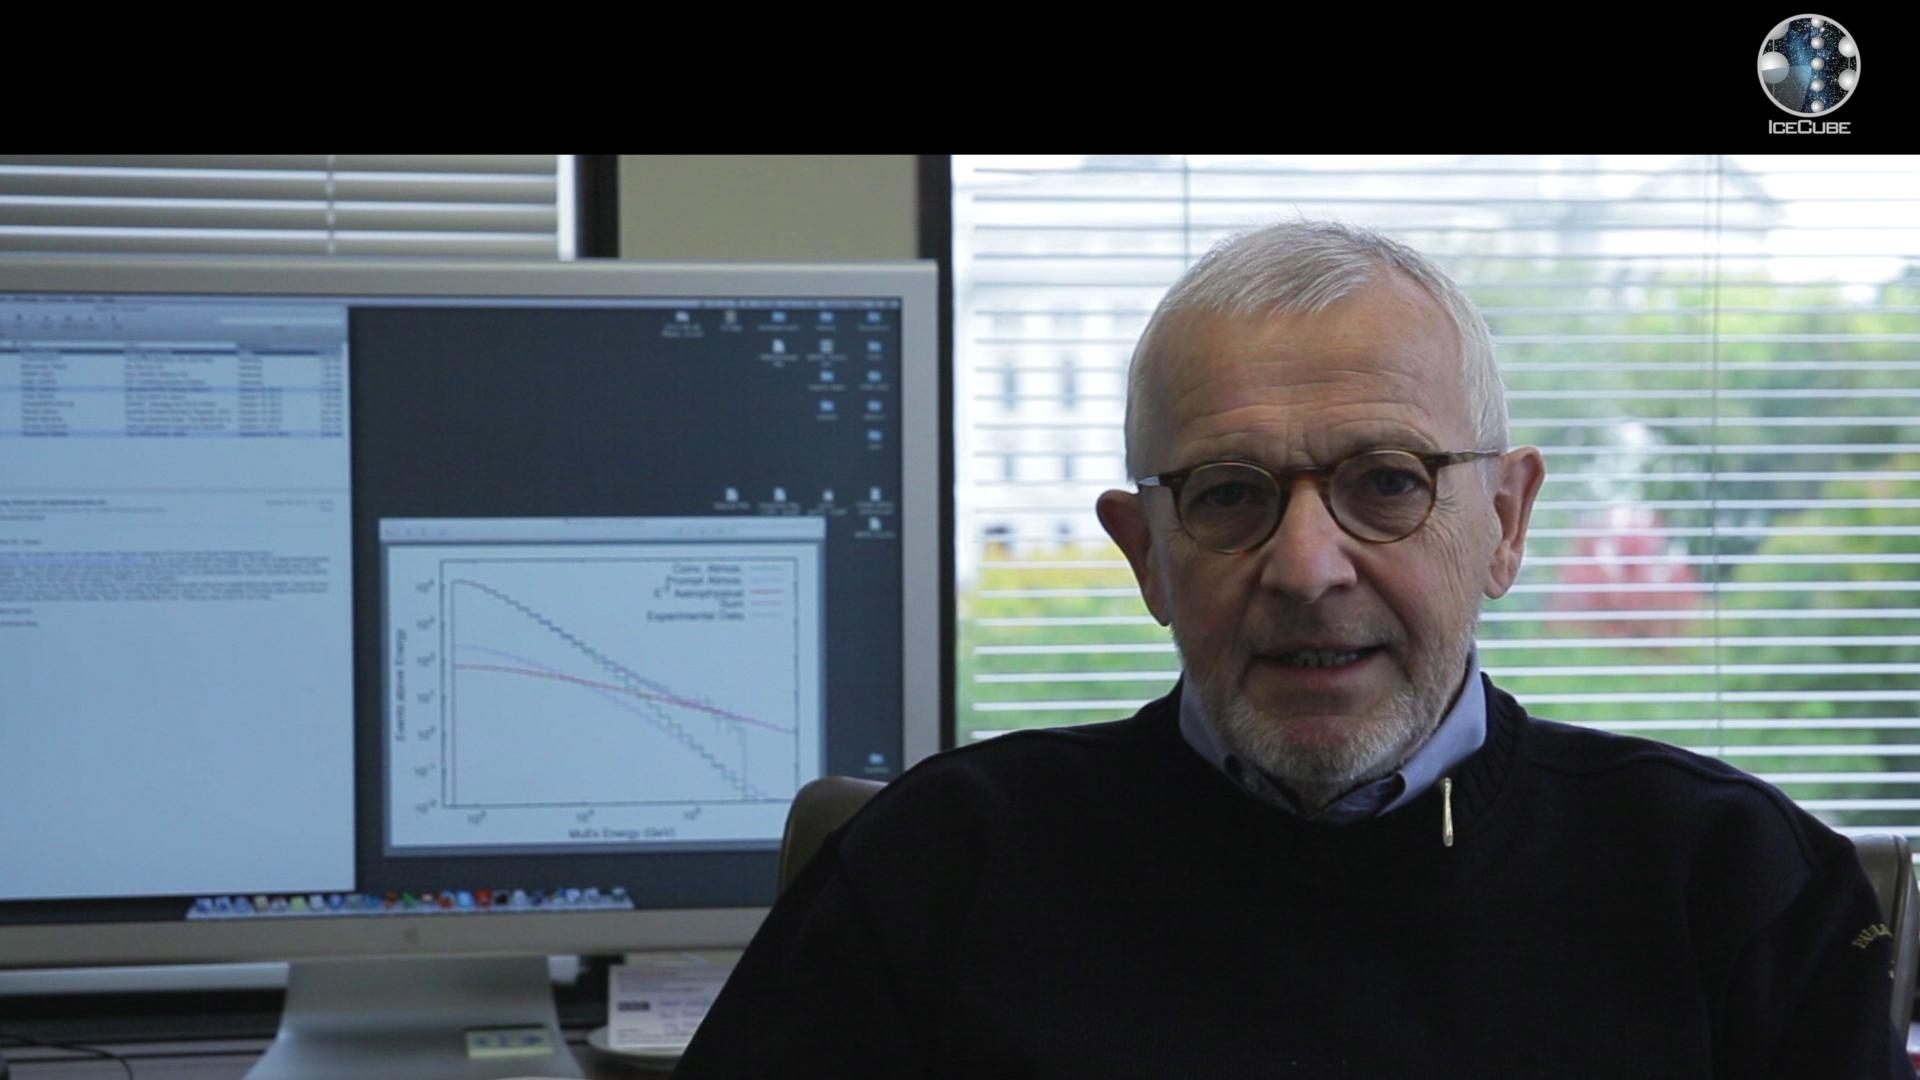 Francis Halzen, IceCube Principal Investigator, On future research in IceCube about cosmic neutrinos